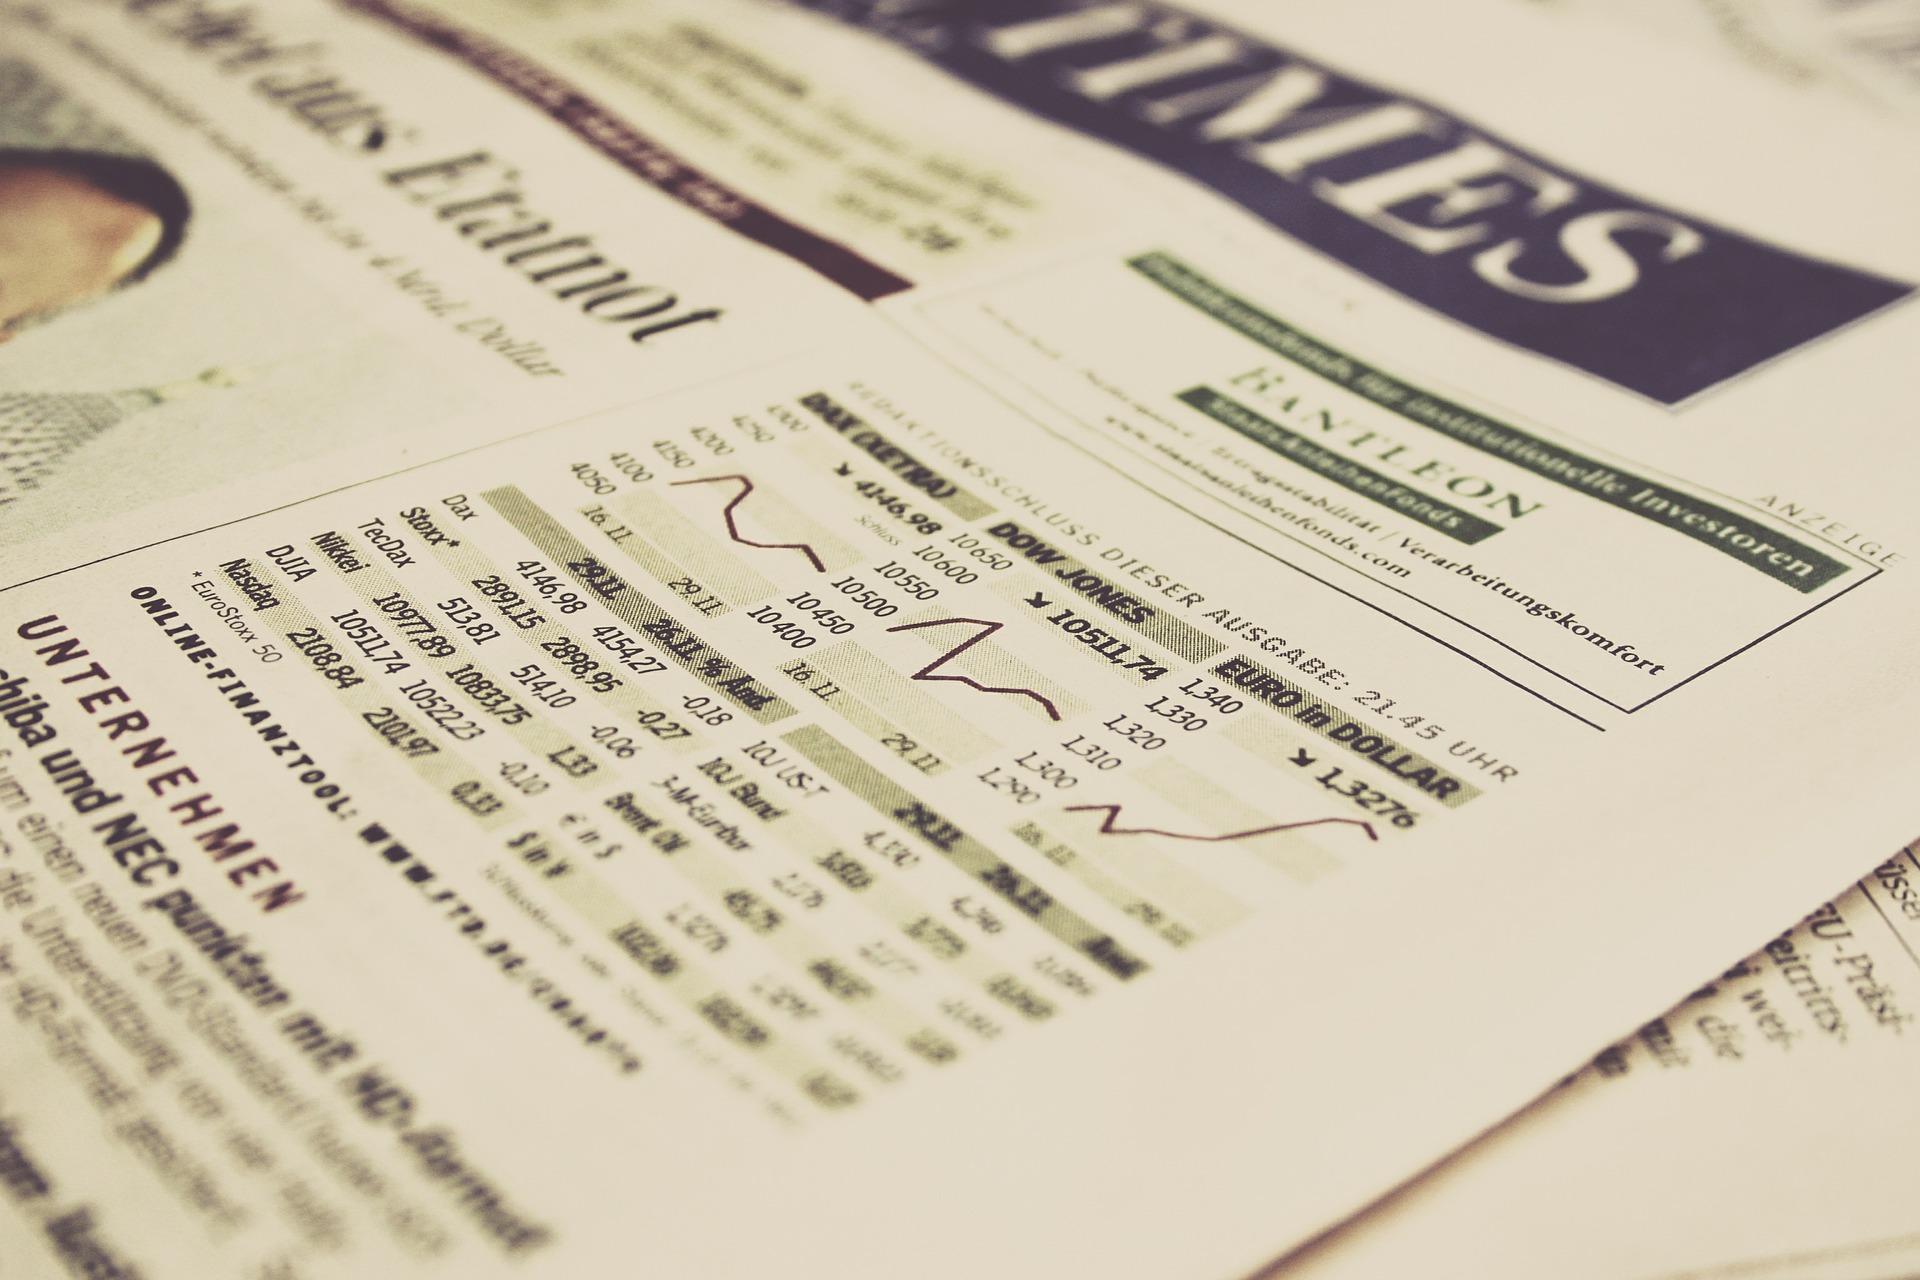 【GWW】W.W.グレインジャーの株価が割安なときの見分け方|配当・決算データまとめ